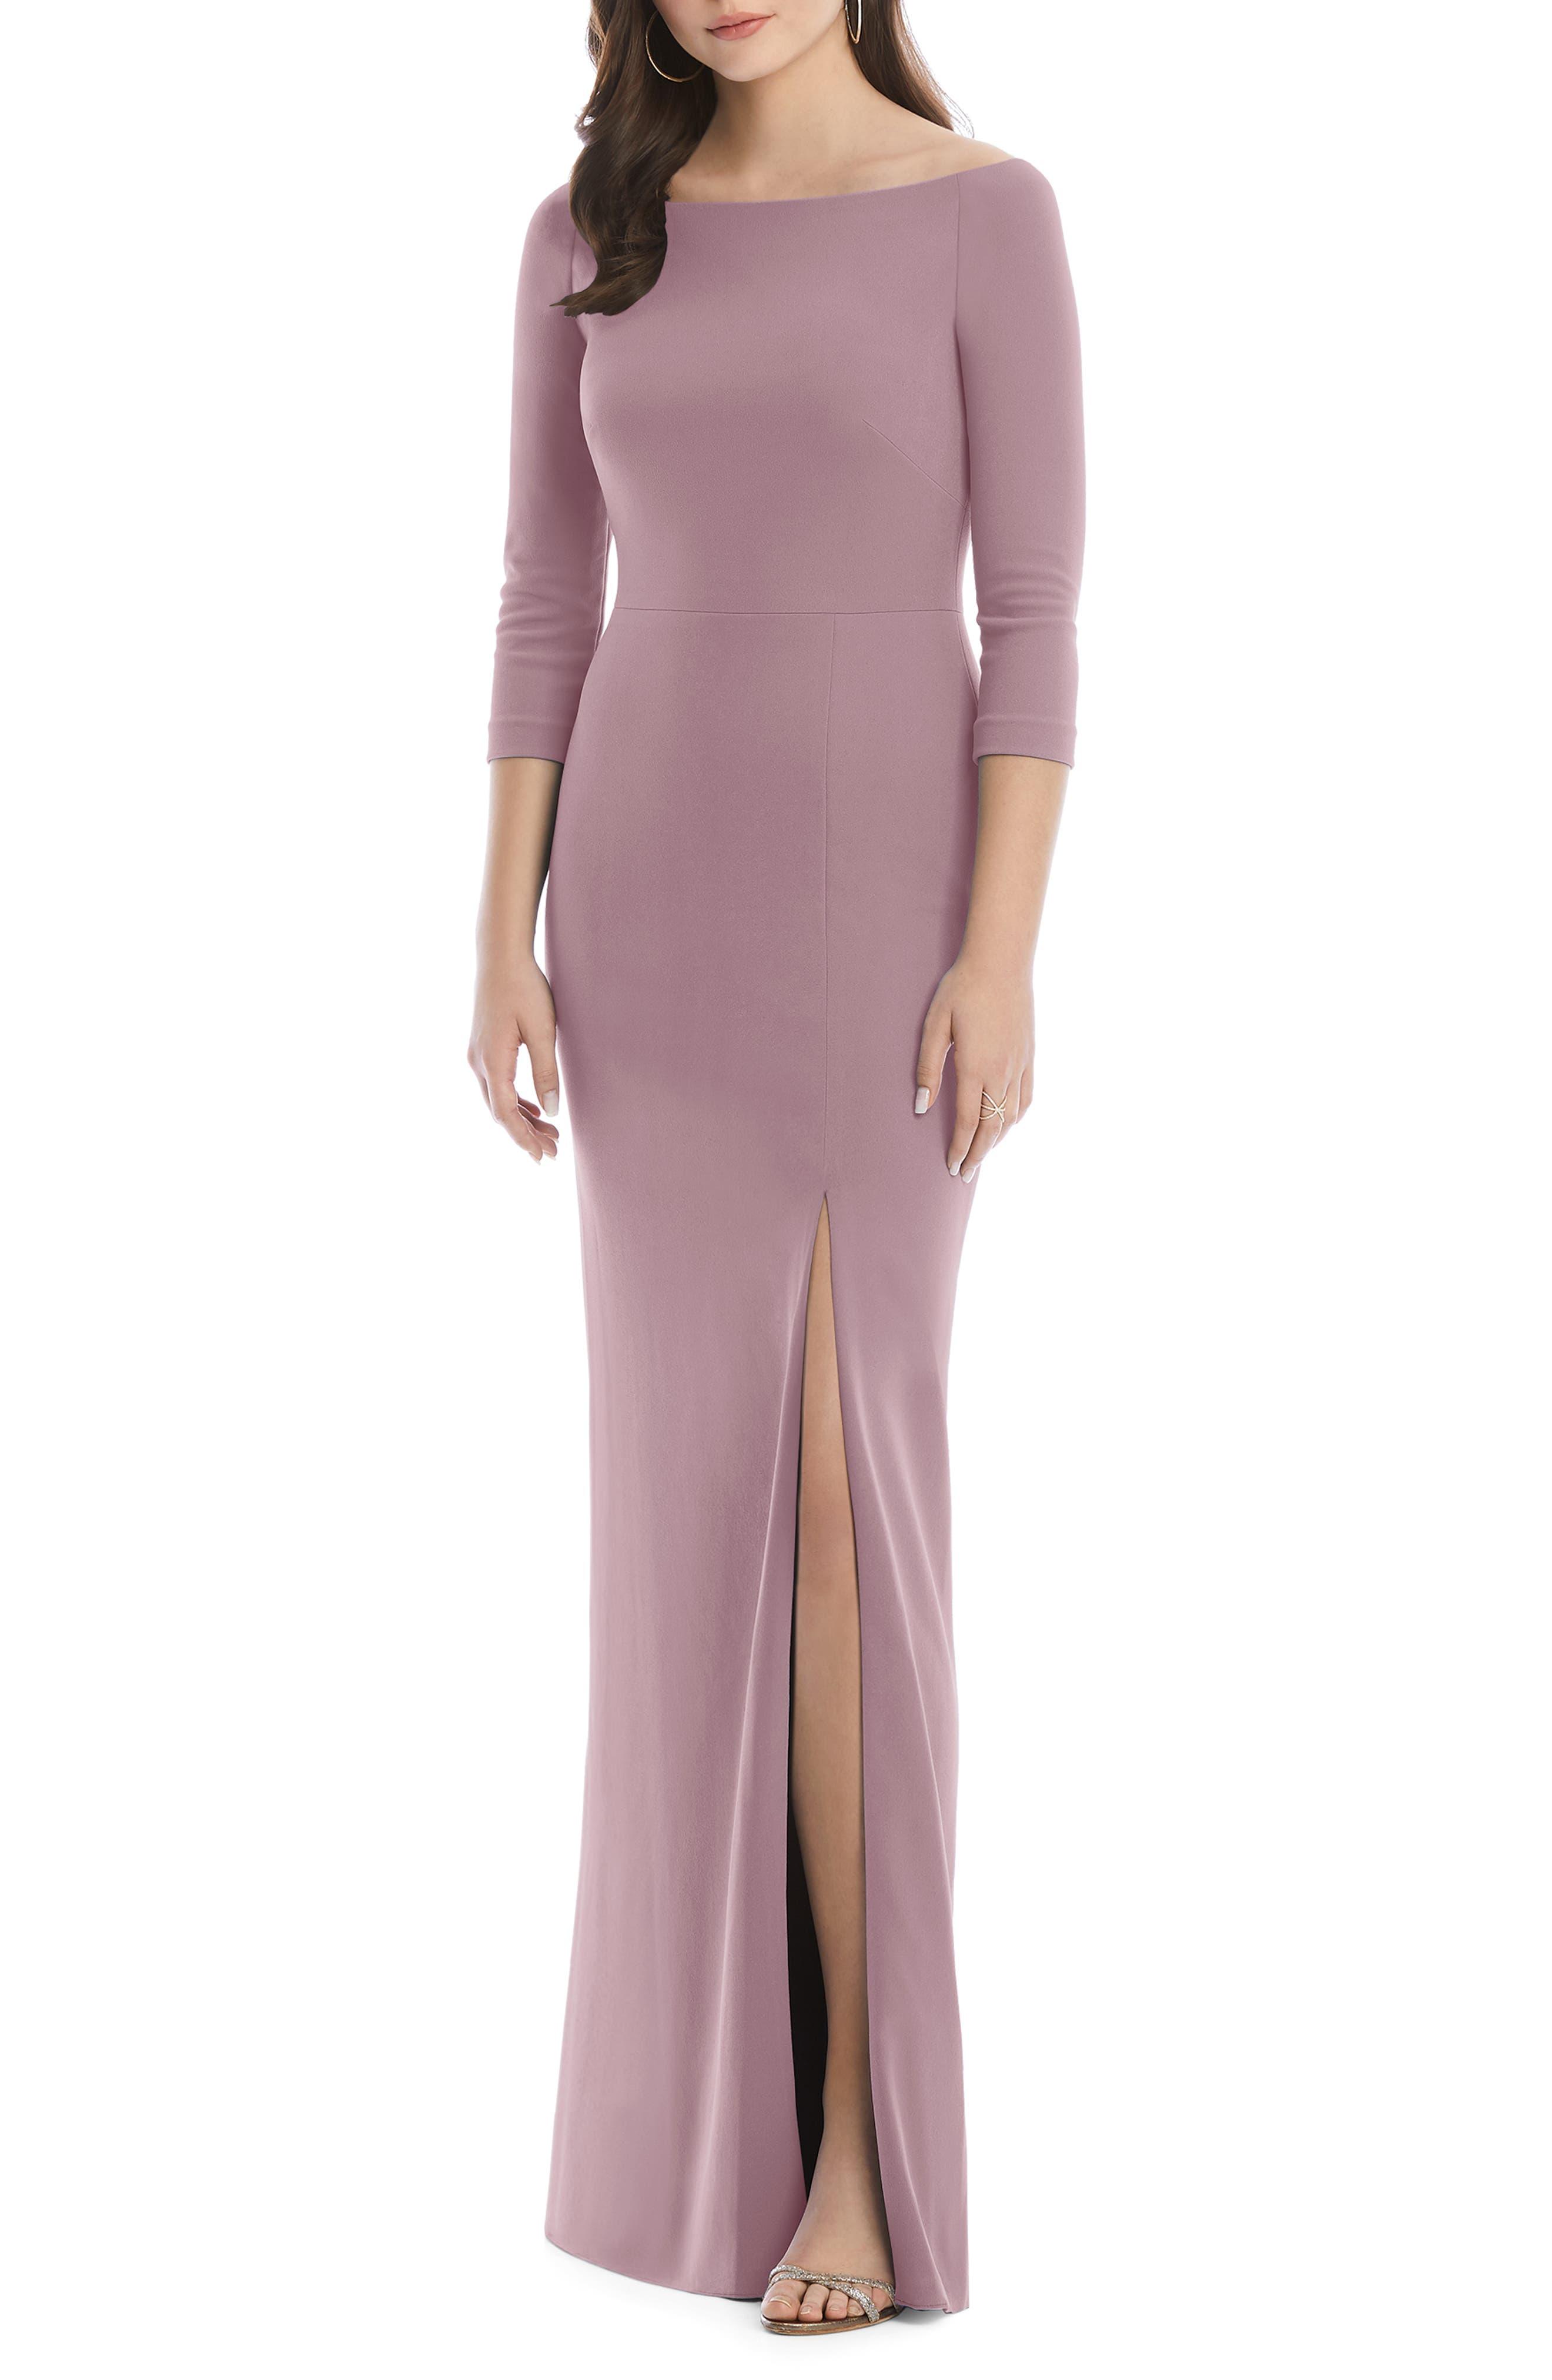 After Six Wide Bateau Neck Stretch Crepe Evening Dress, Pink